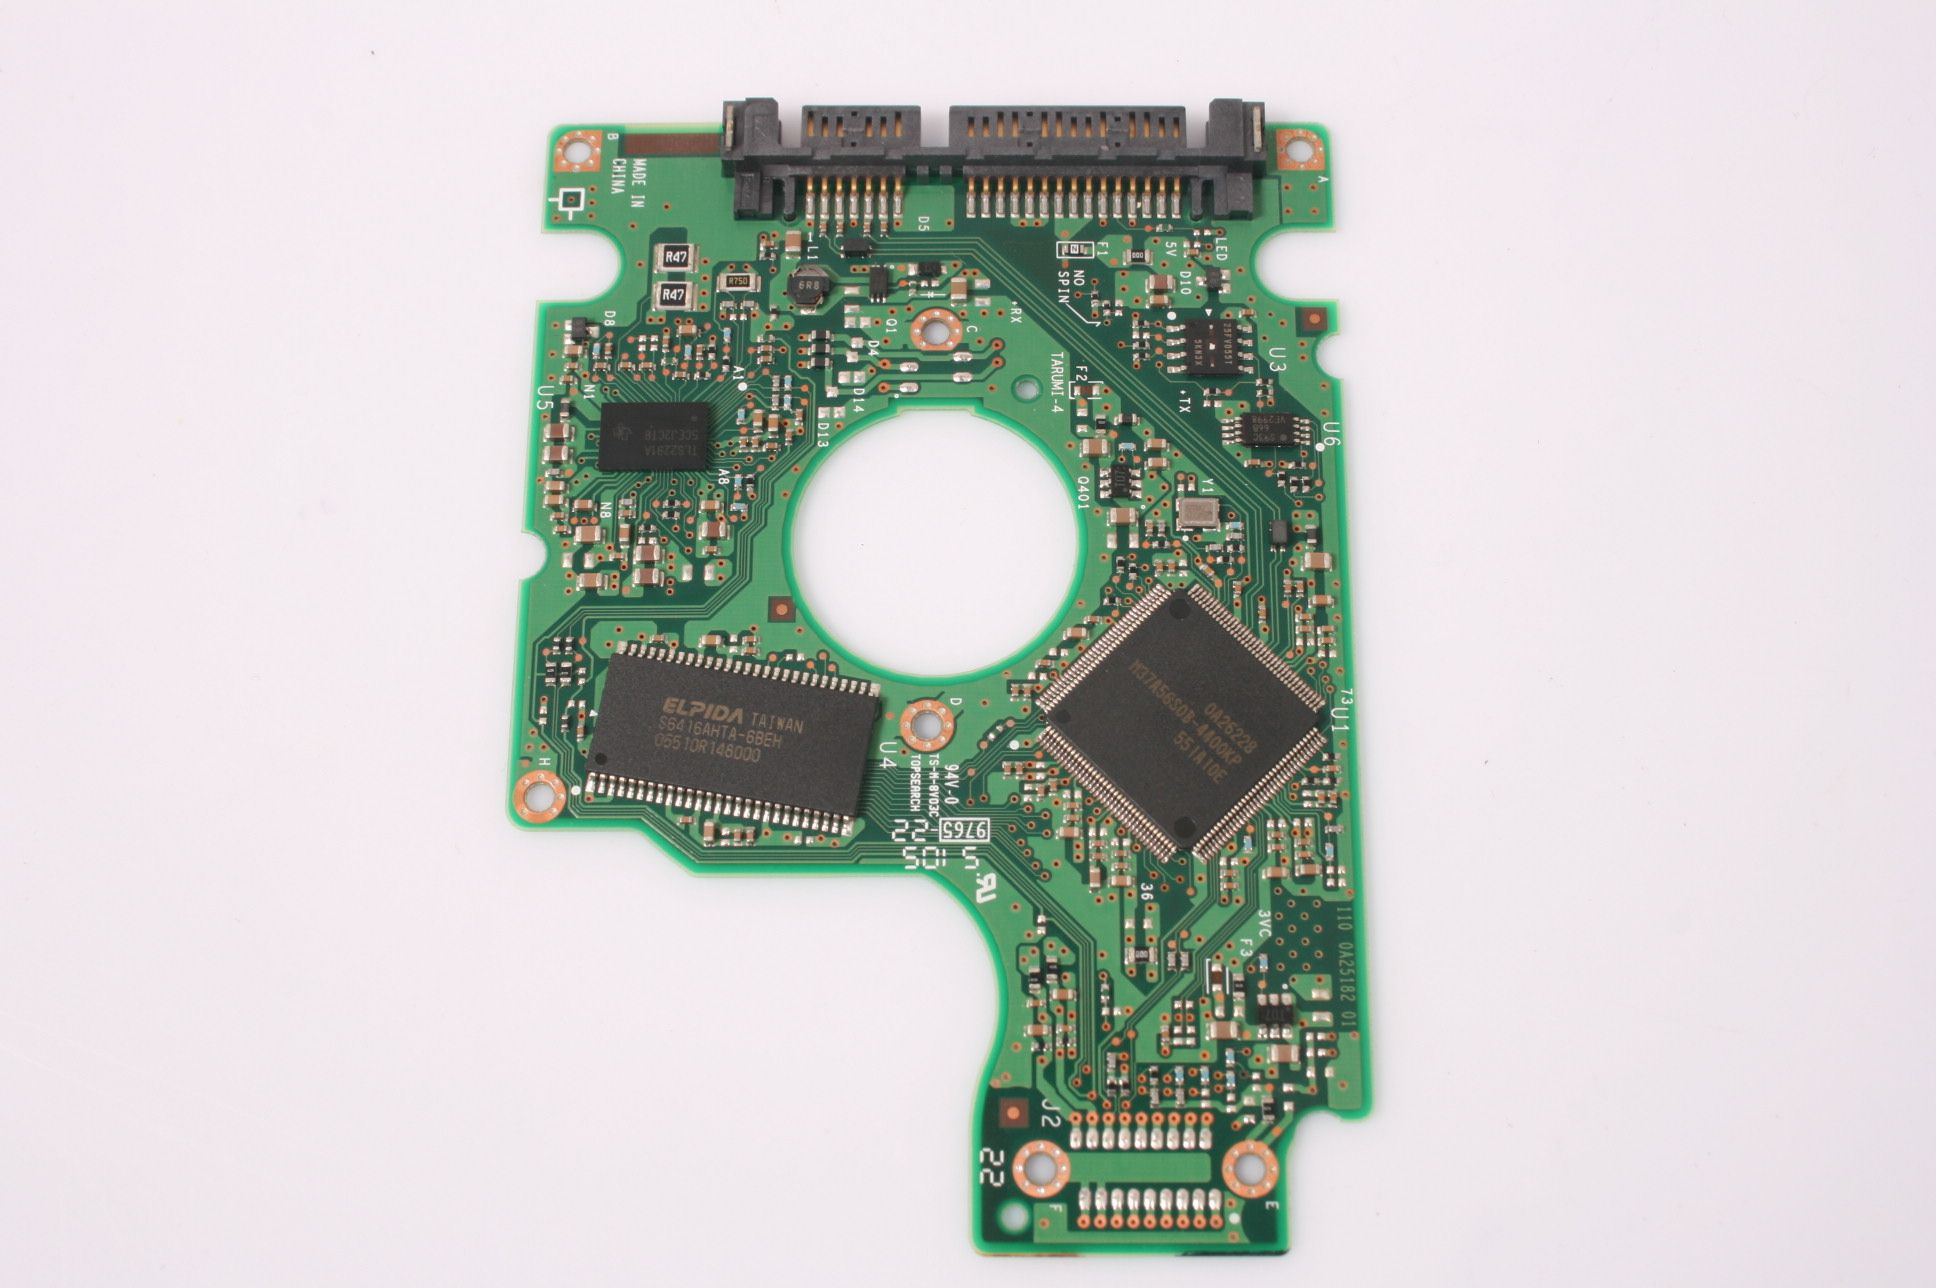 HITACHI Travelstar 60GB HTS541060G9SA00 SATA 2,5 HARD DRIVE / PCB (CIRCUIT BOARD) ONLY FOR DATA